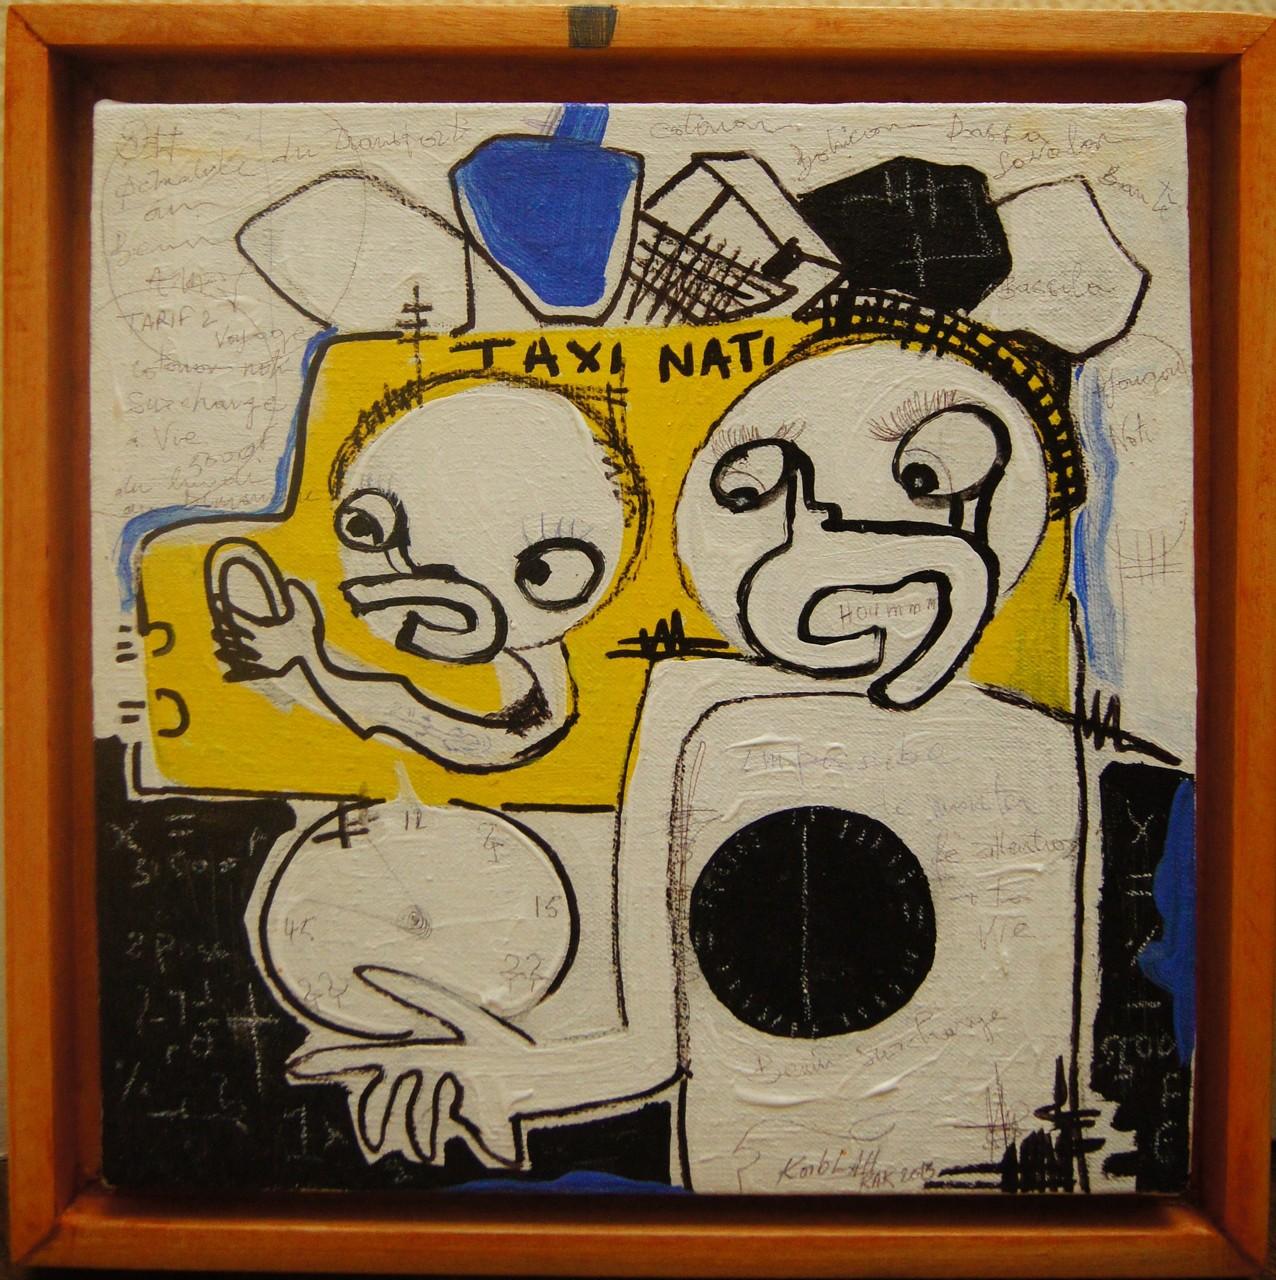 Taxi Nati - 2013 - 26,5 x 26,5 cm - Acrylique